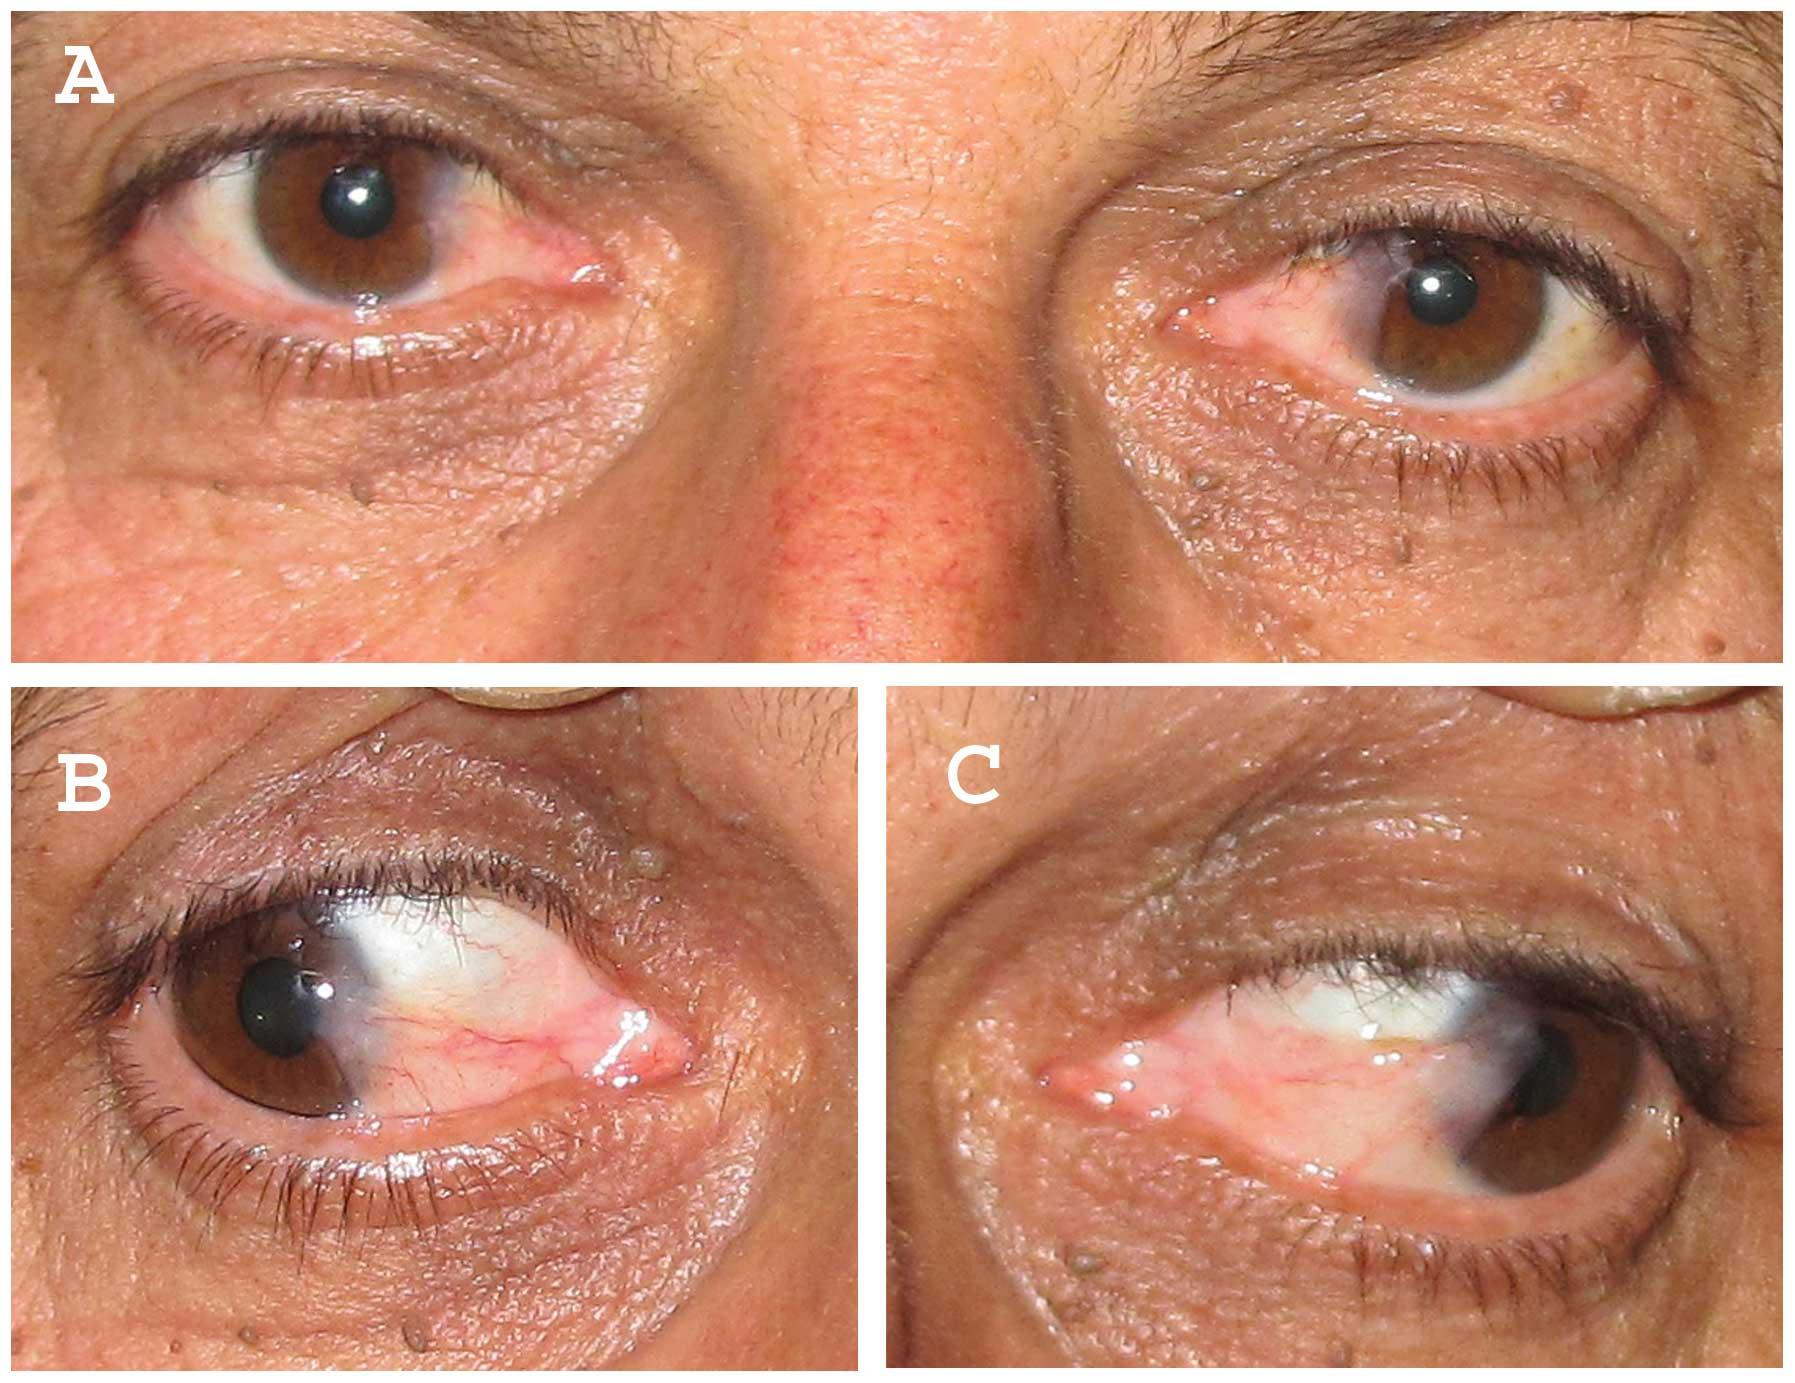 papilloma eye infection